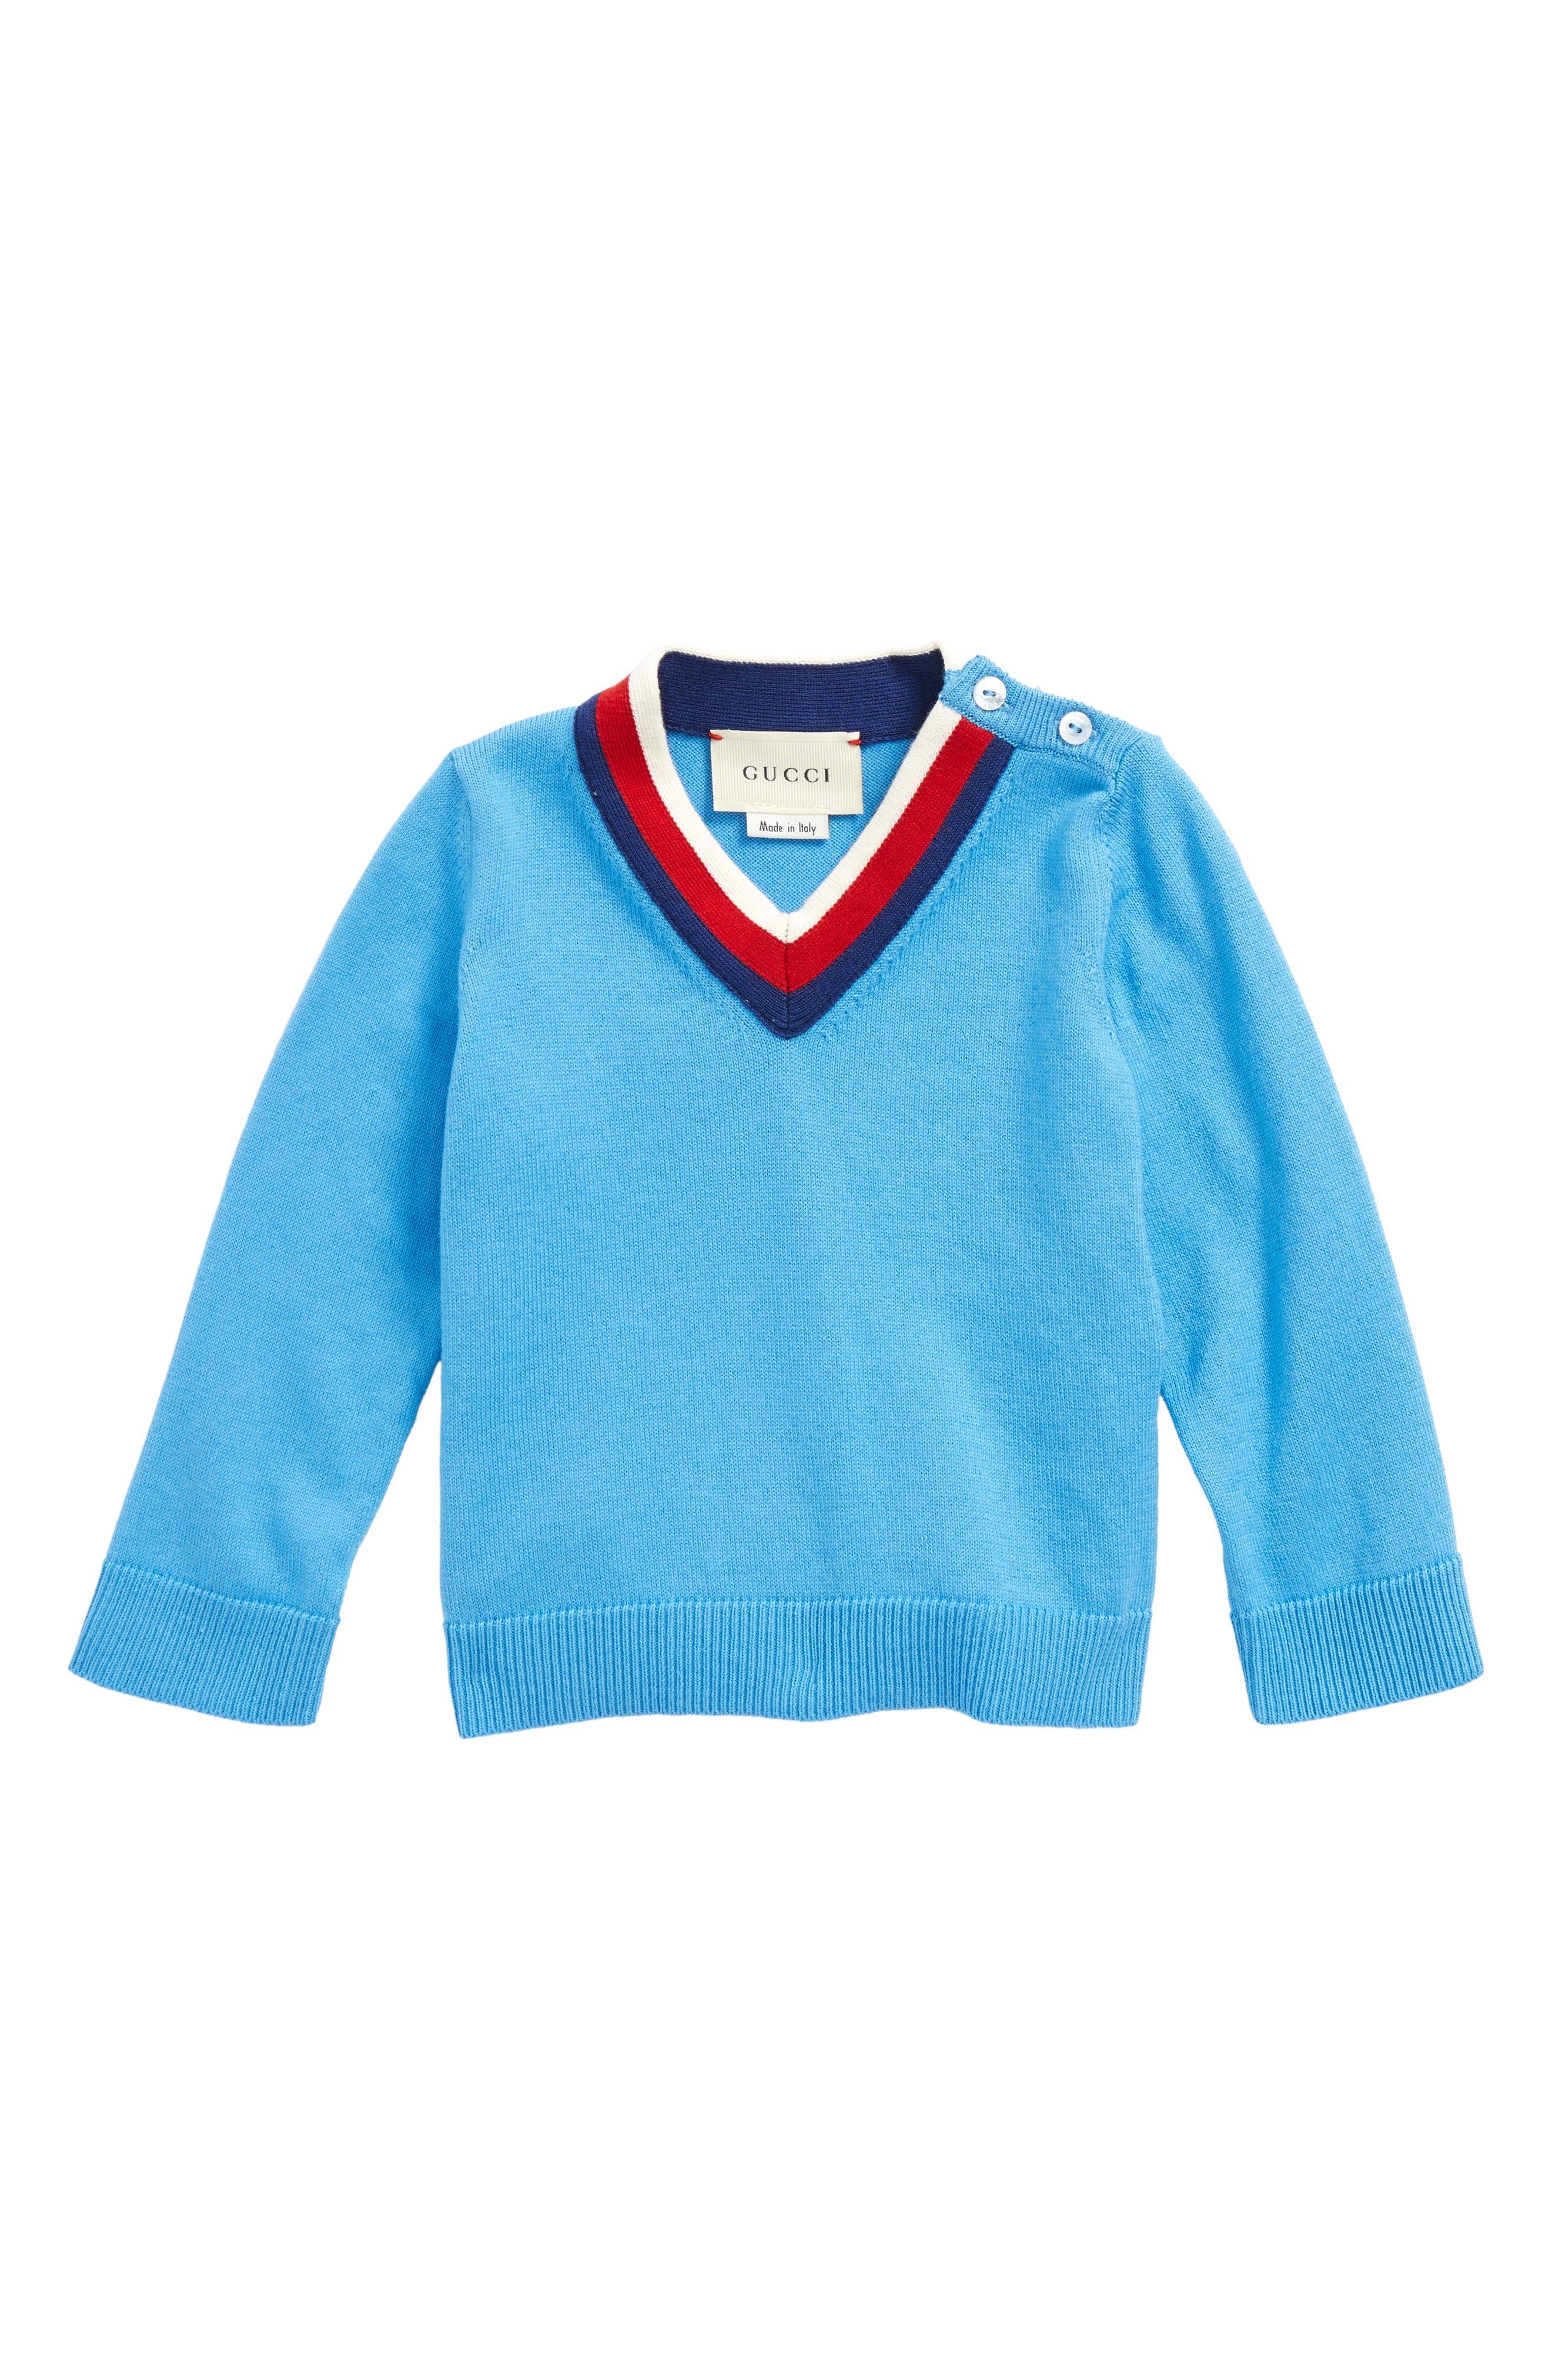 V-Neck Sweater,                         Main,                         color, Royal/ Ivory